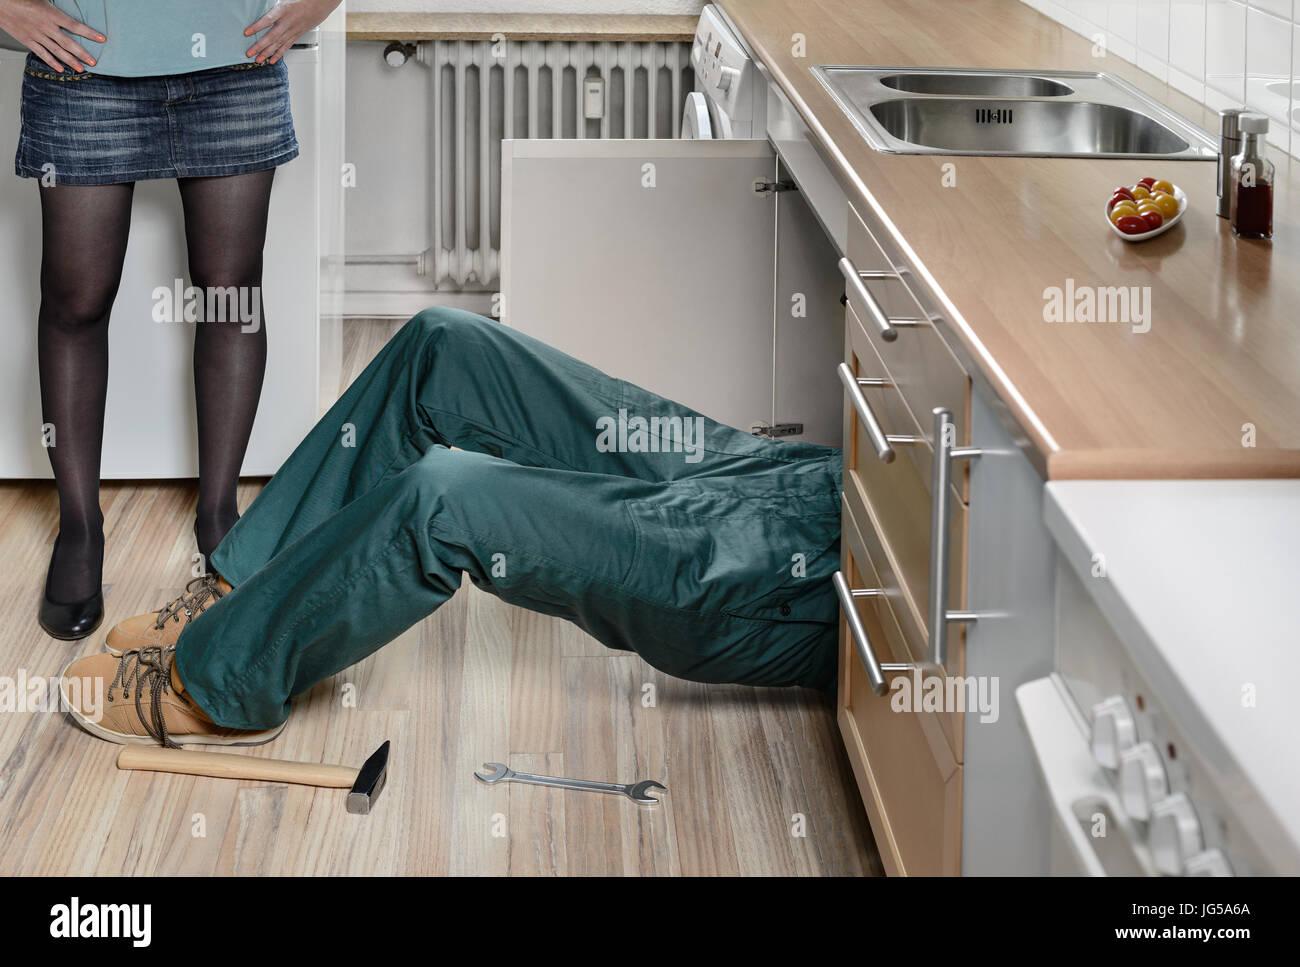 Plumber installer service reparing kitchen sink installation - Stock Image